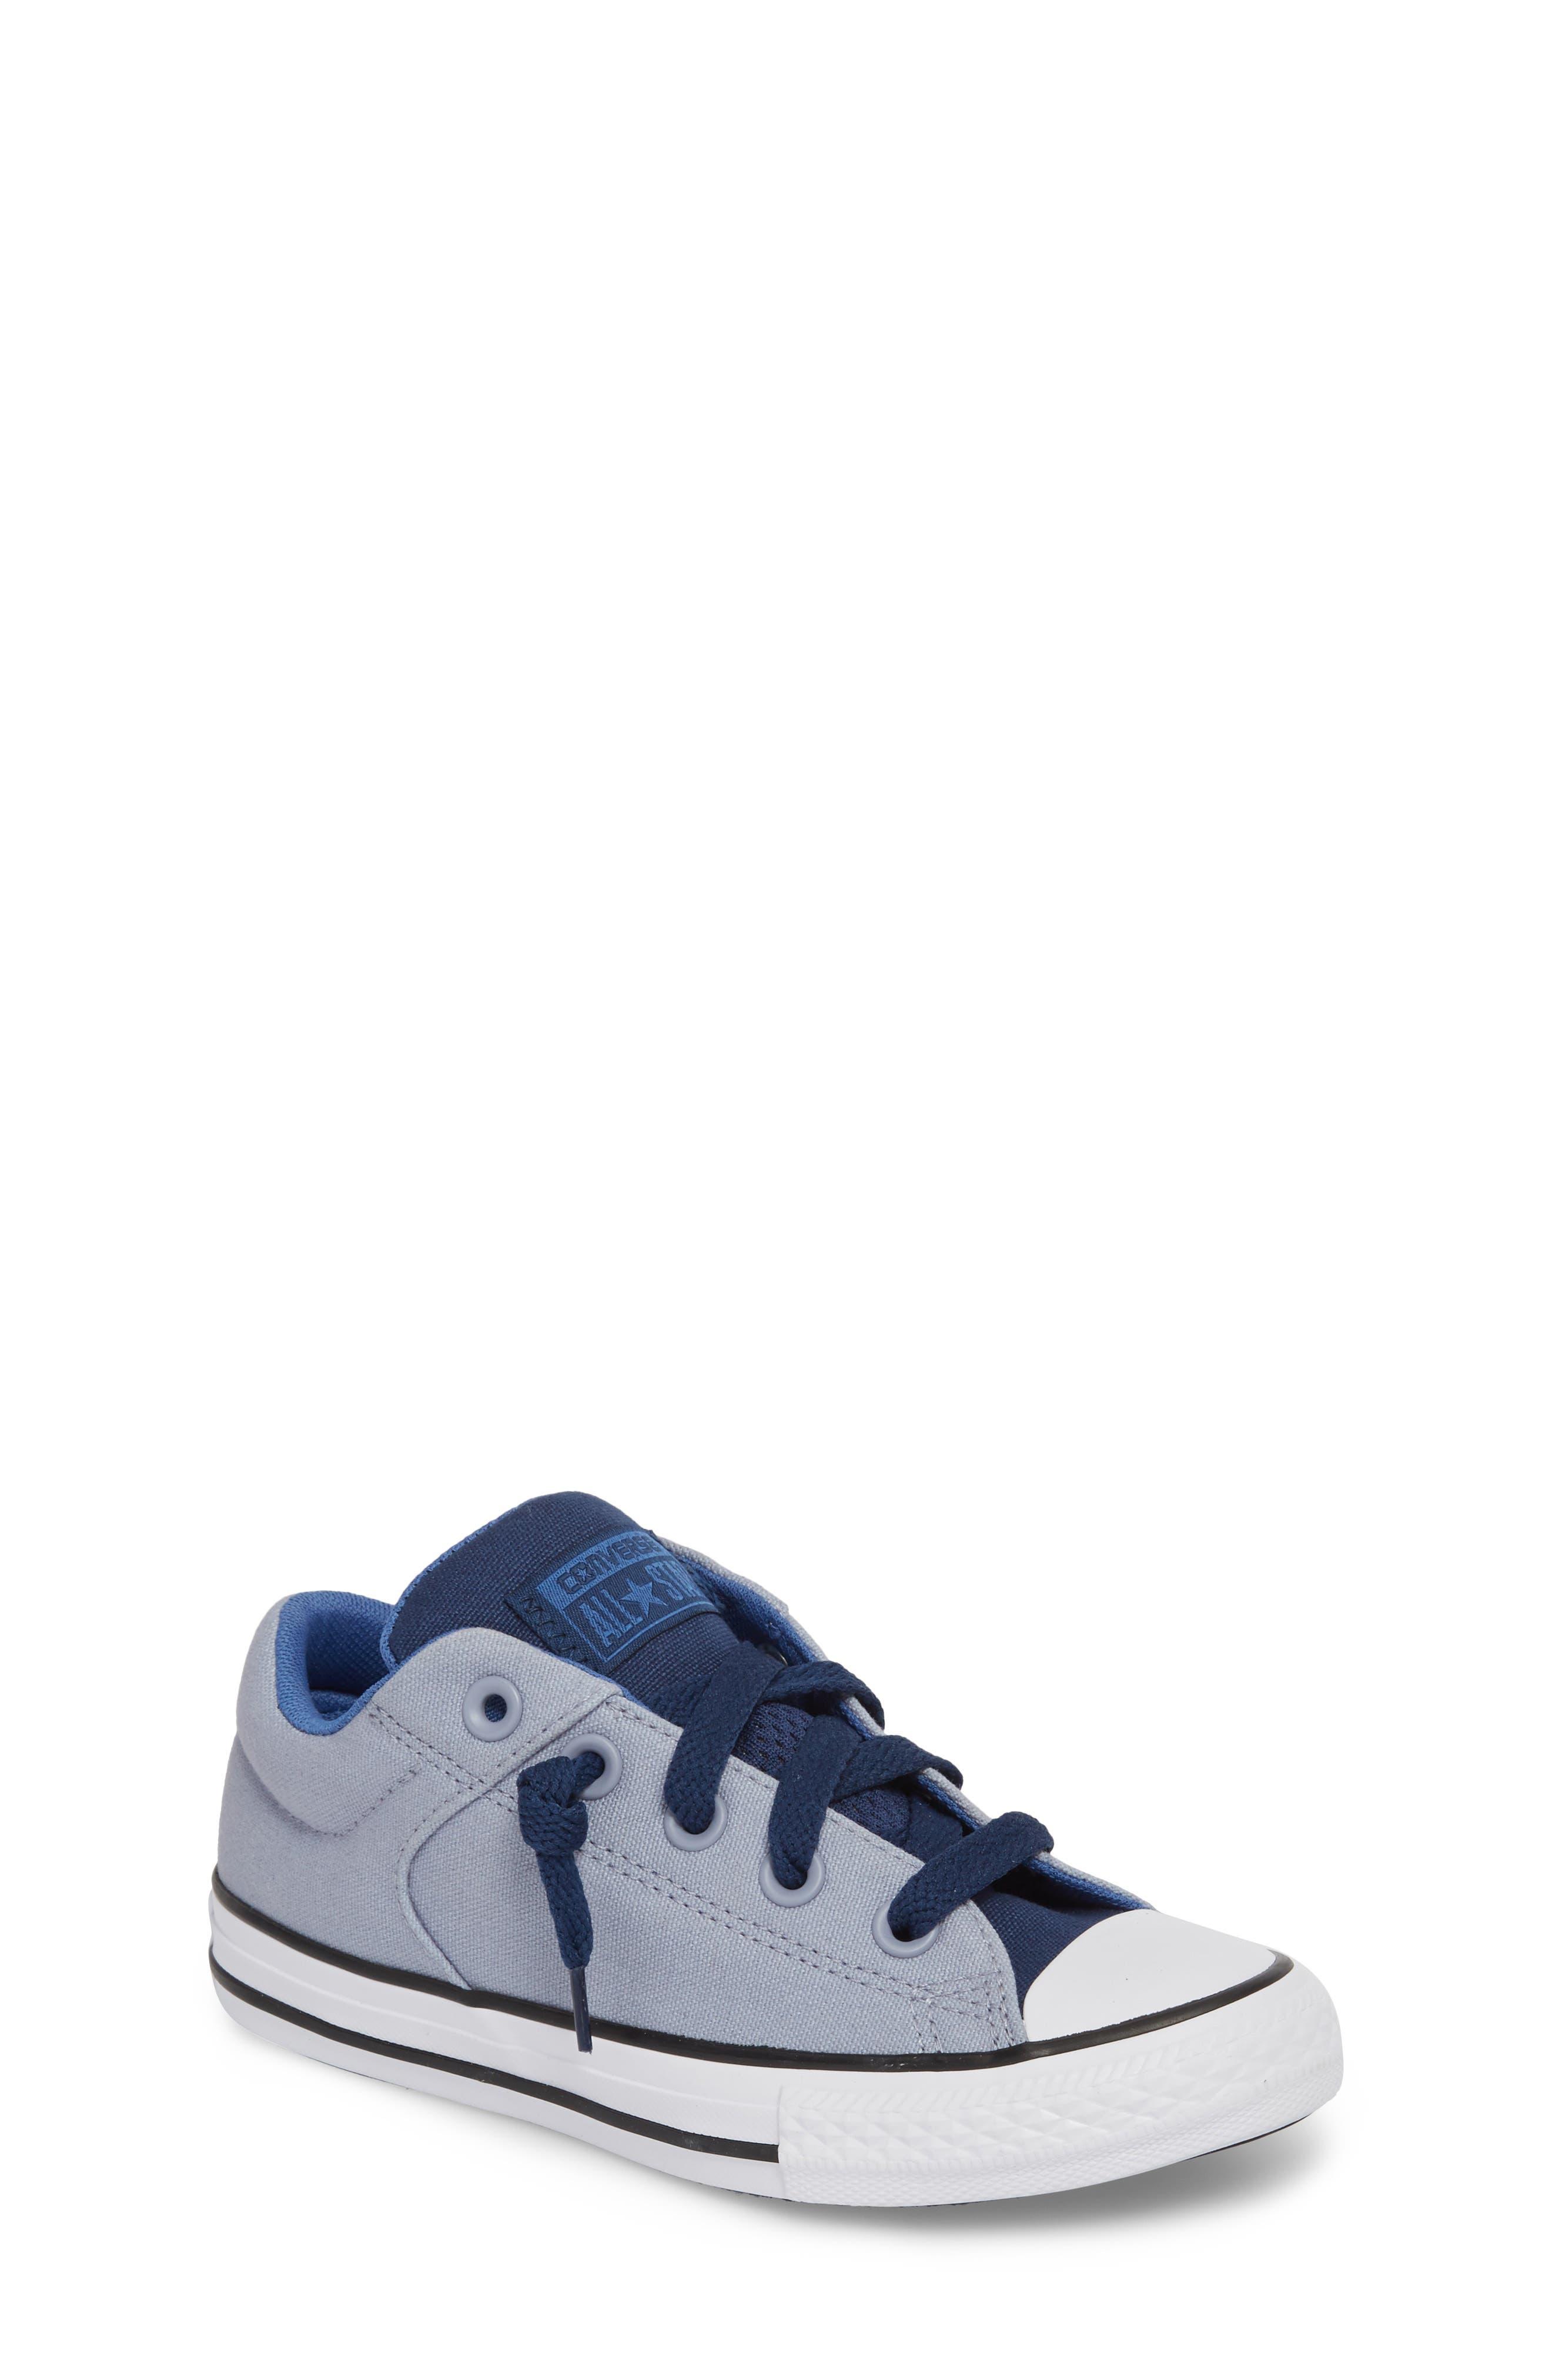 Chuck Taylor<sup>®</sup> All Star<sup>®</sup> 'High Street' Slip-On Sneaker,                             Main thumbnail 1, color,                             Glacier Grey